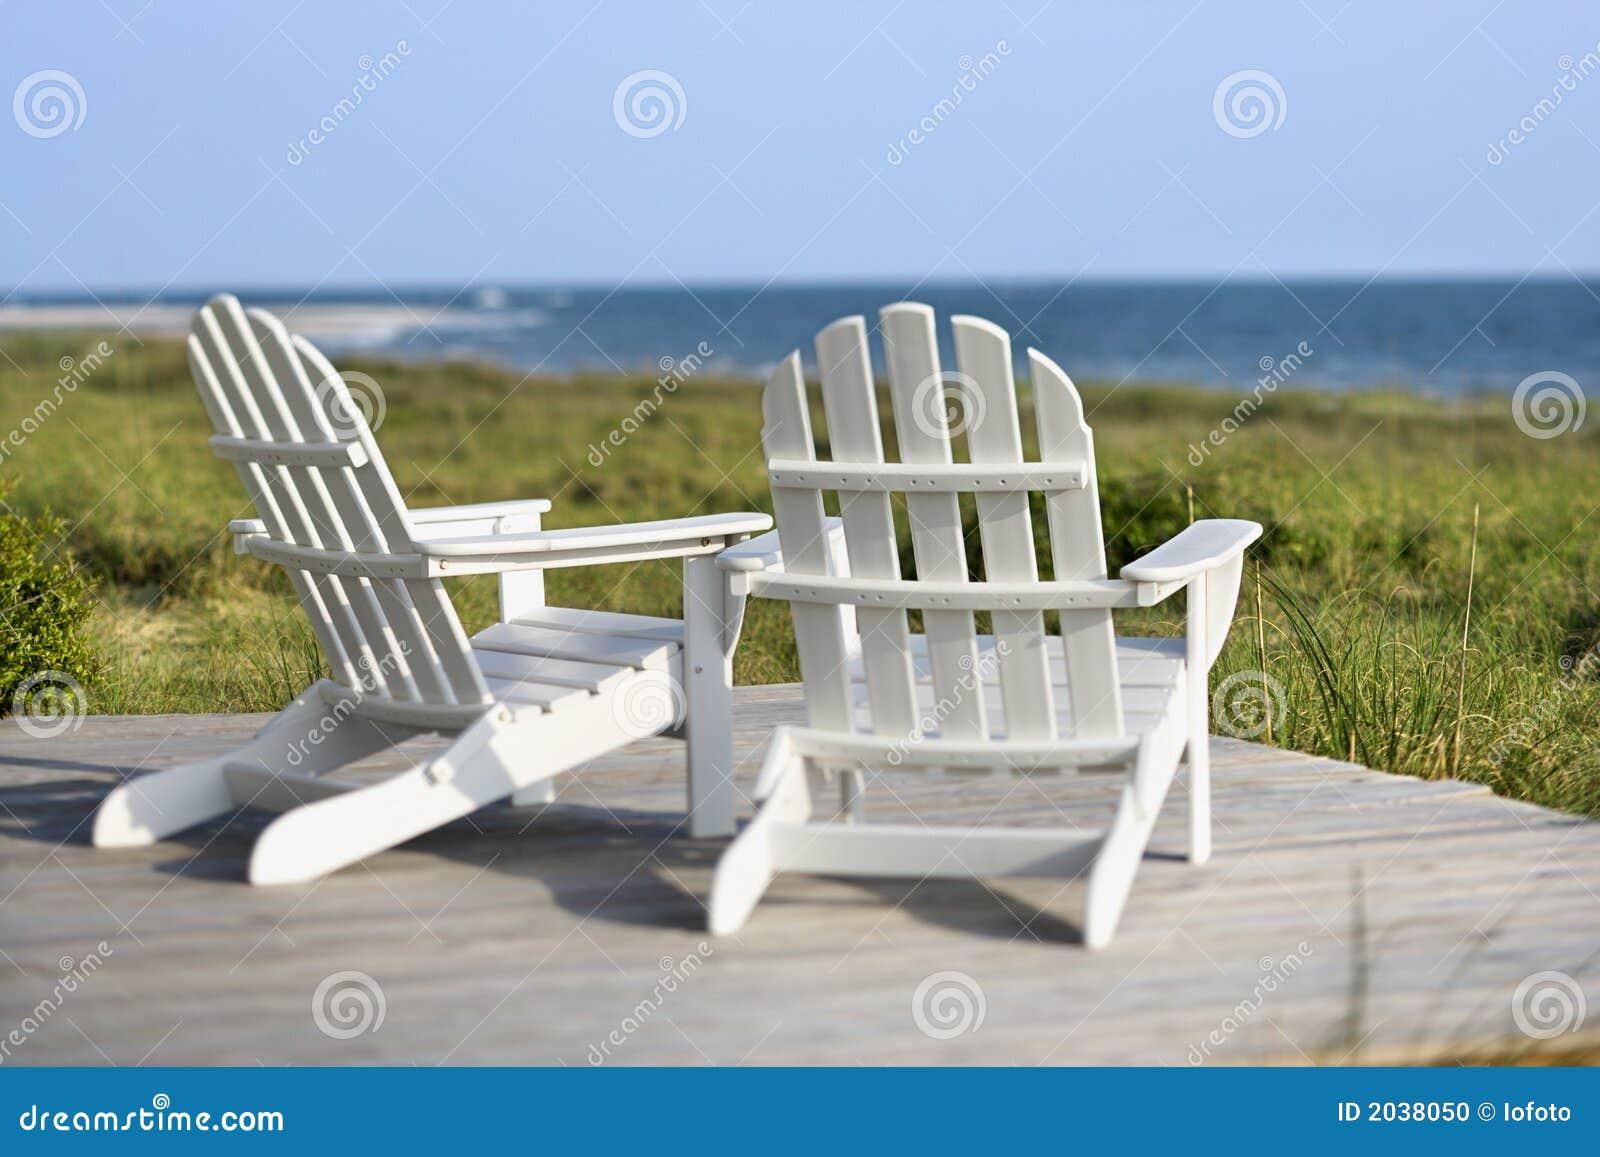 ... Chair Clip Art Adirondack chairs overlooking Green Mountains Clip Art